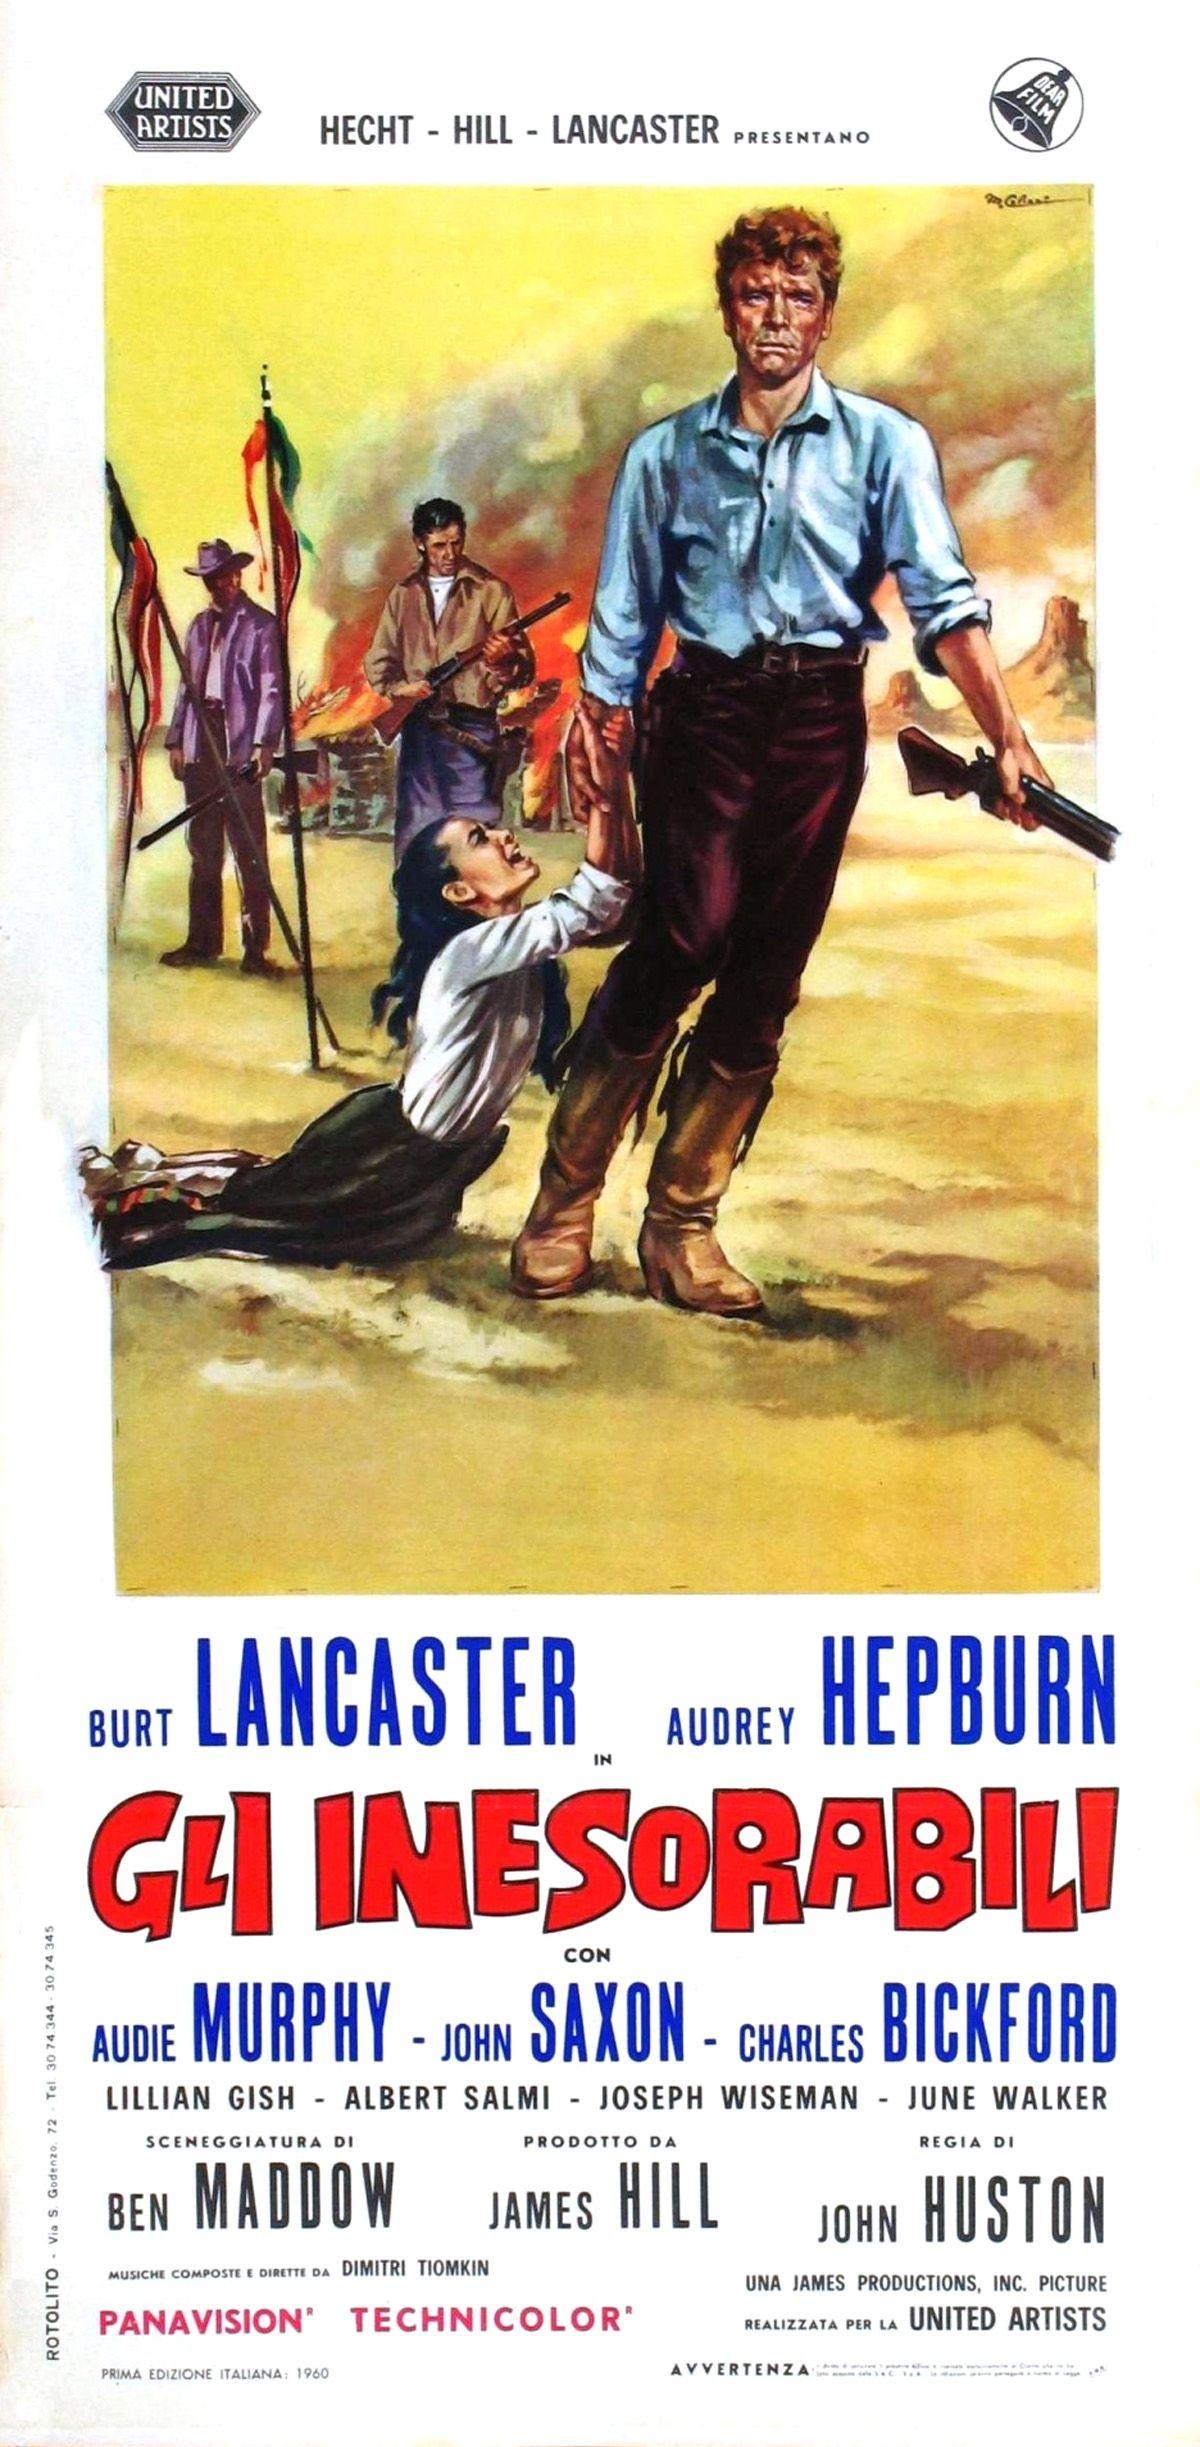 Audrey Hepburn The Unforgiven 1960 Starring Burt Lancaster